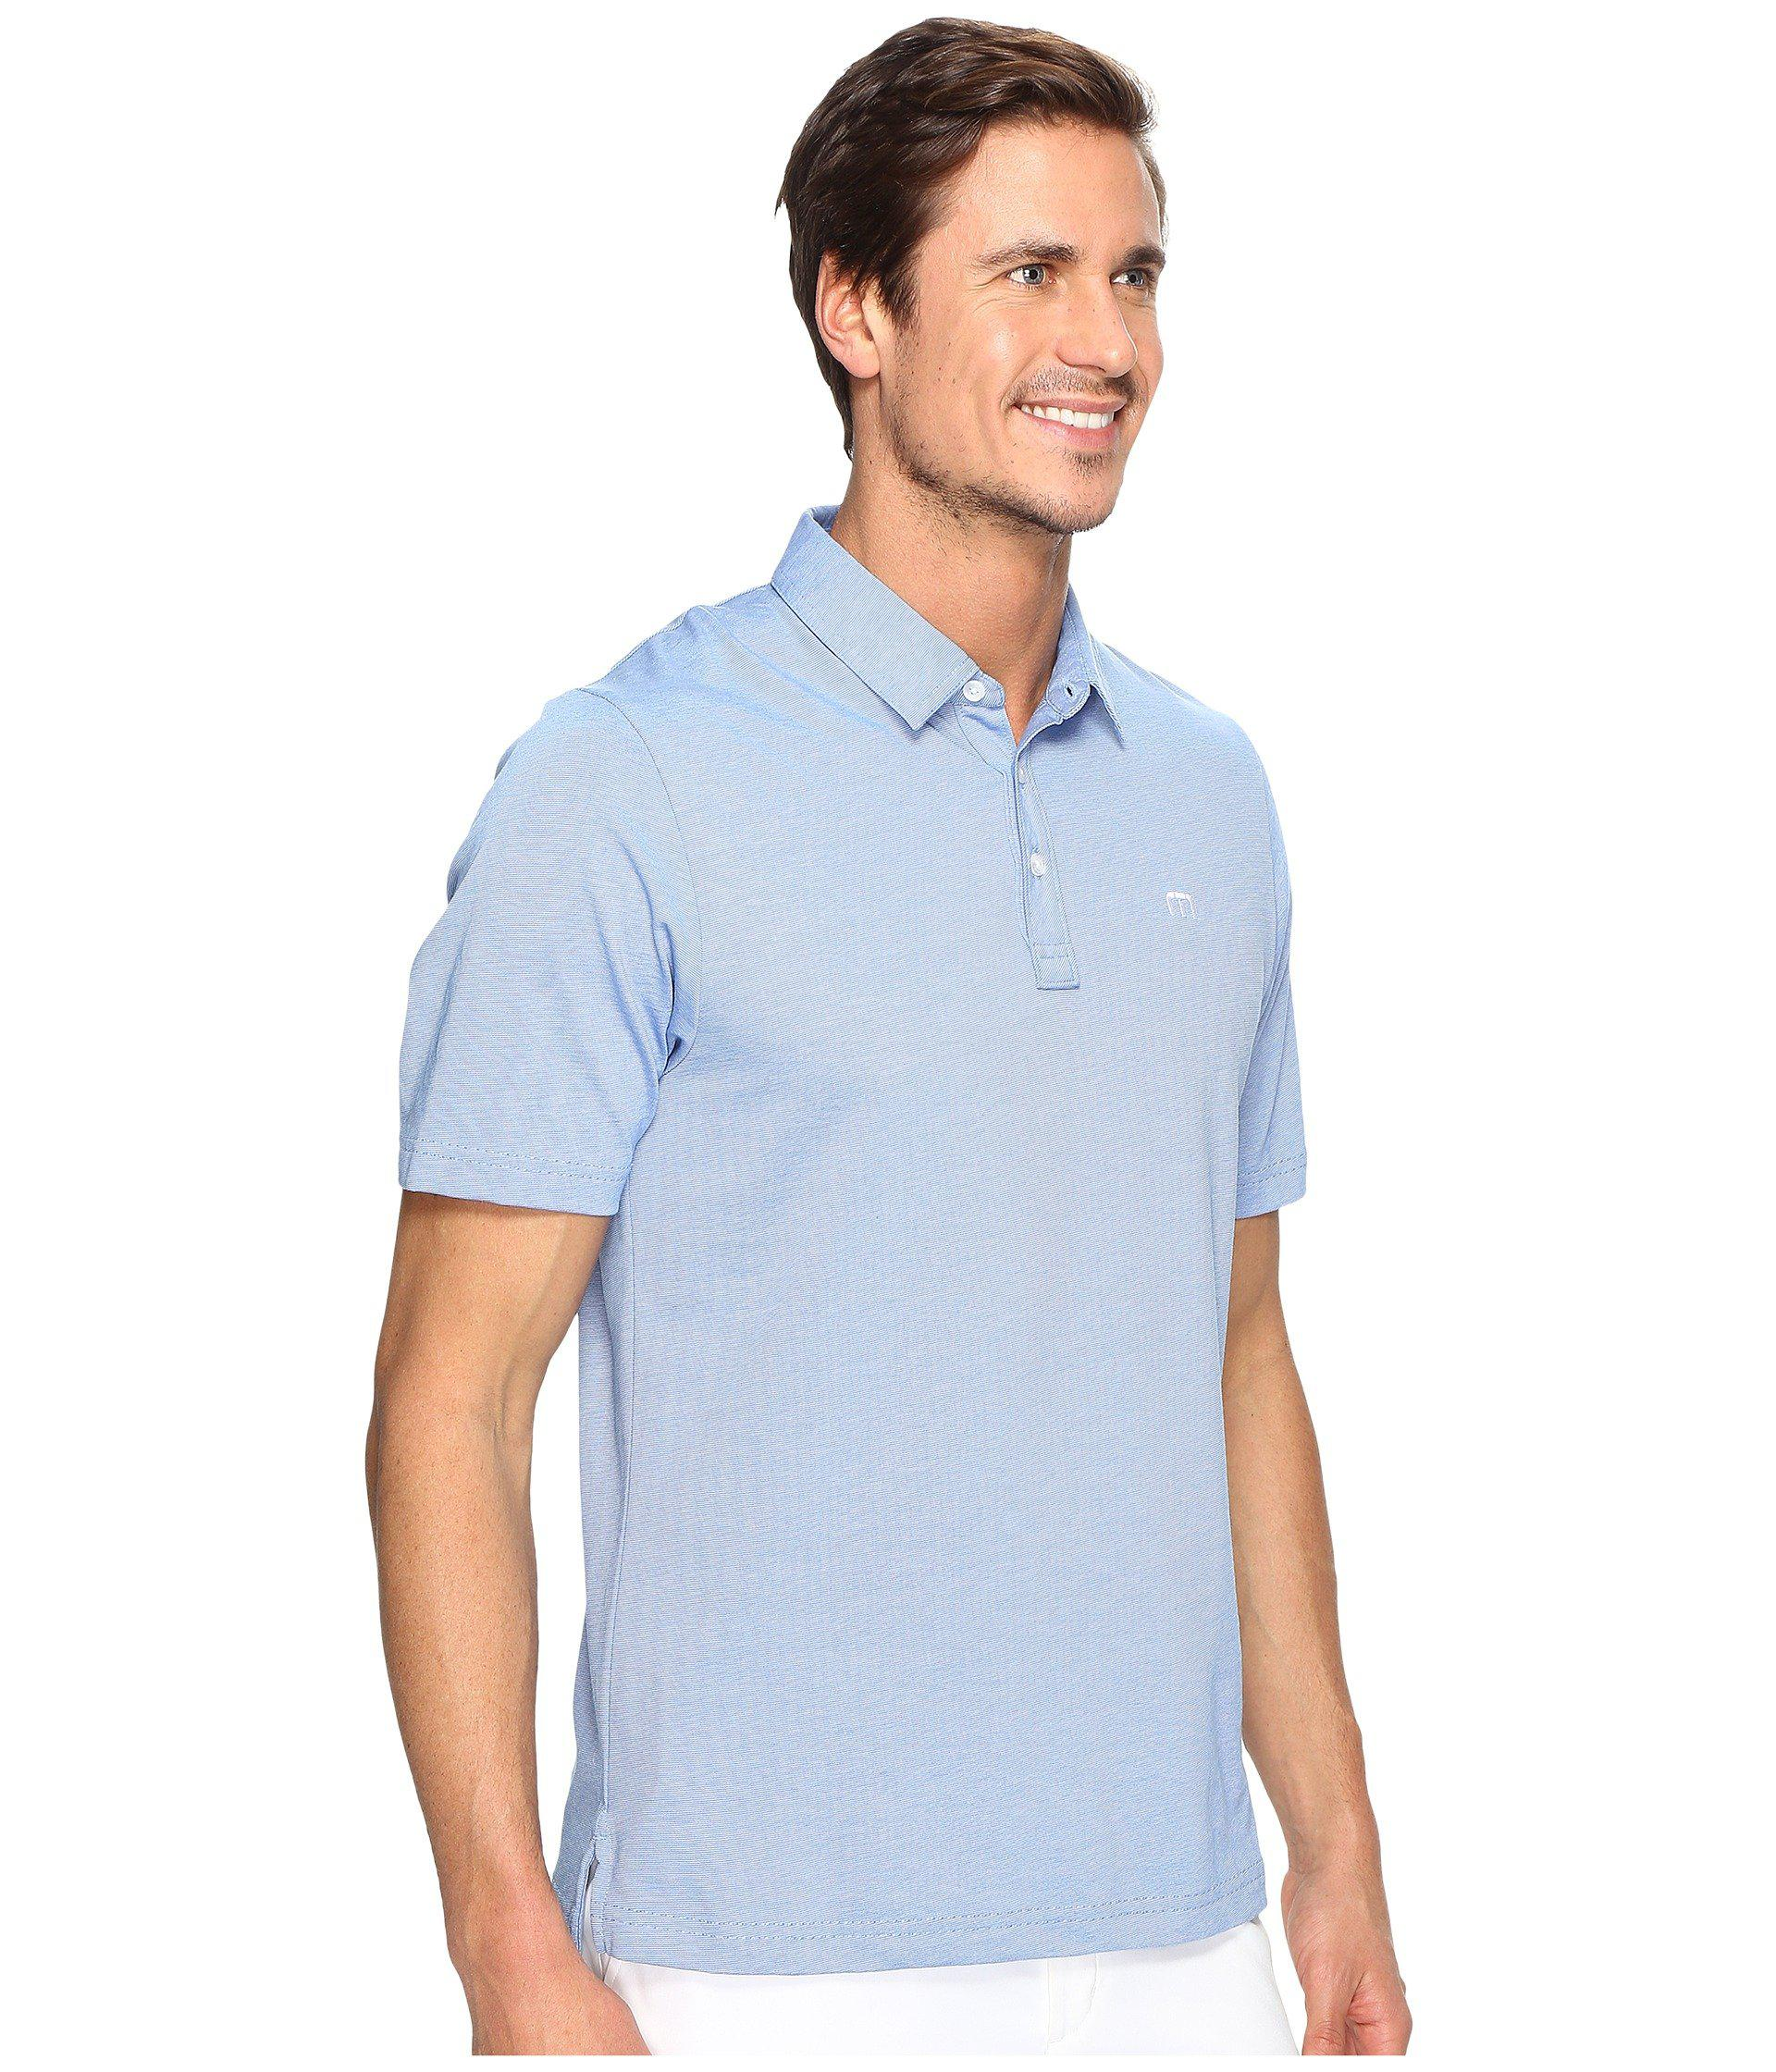 cc318c71 Travis Mathew The Zinna Polo (black) Men's Clothing in Blue for Men ...